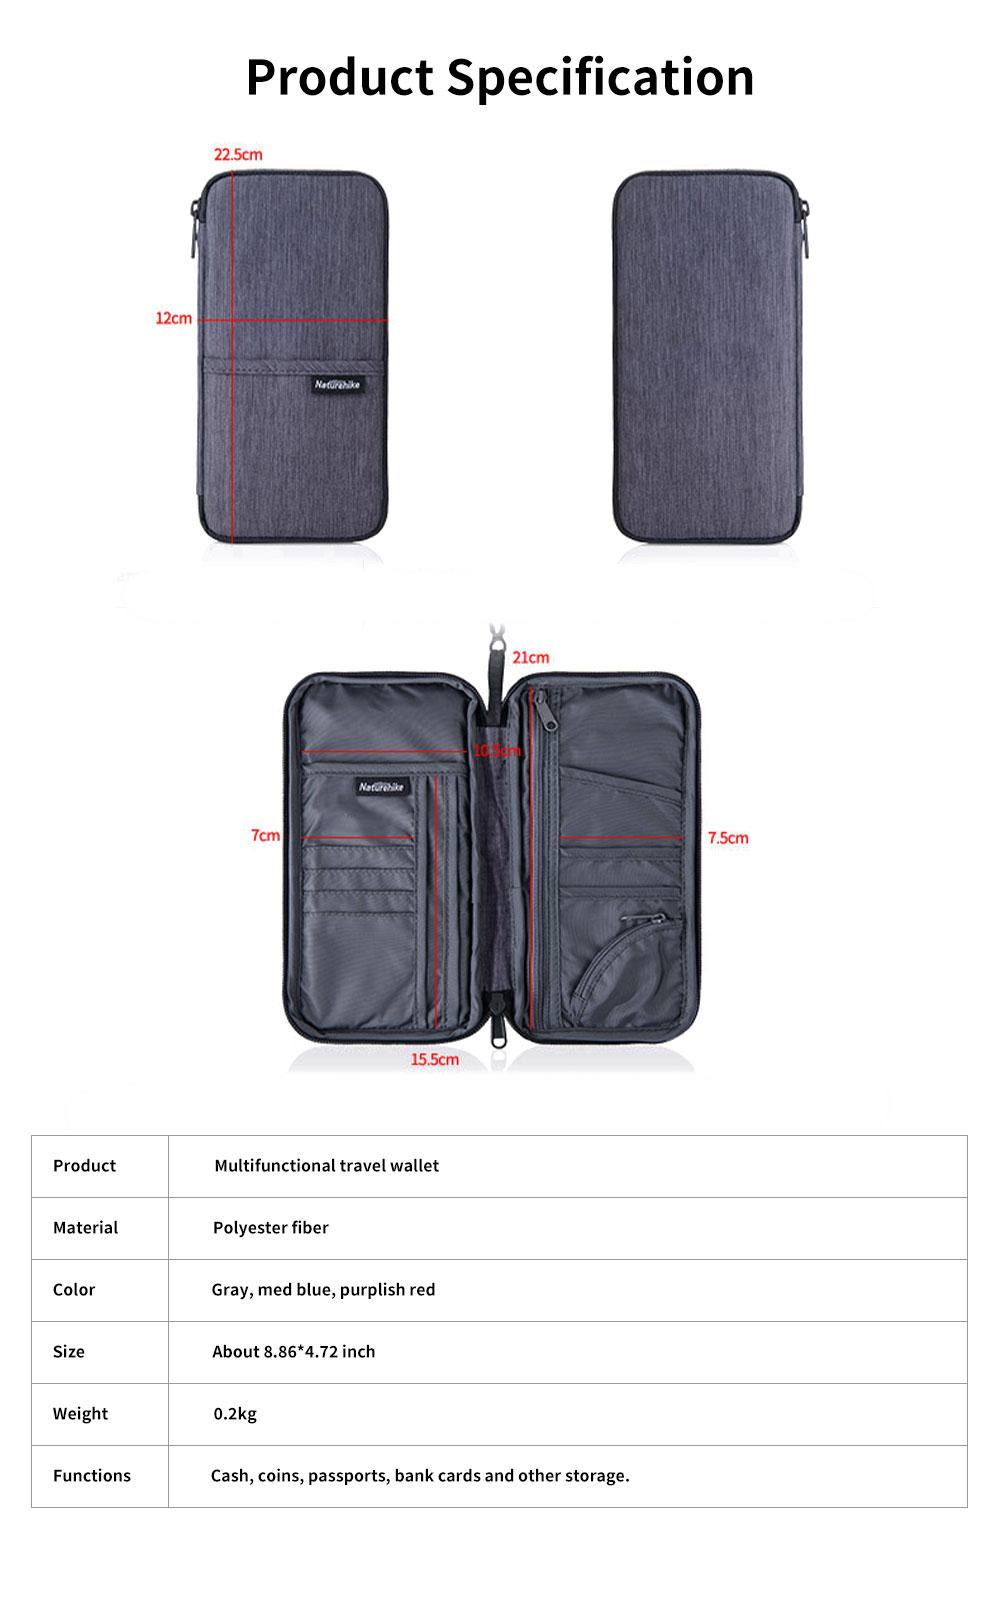 NH Travel Wallet Multifunctional Storage Bag Waterproof Documents Cash Change Passports Zipper Simple Card Holder 7